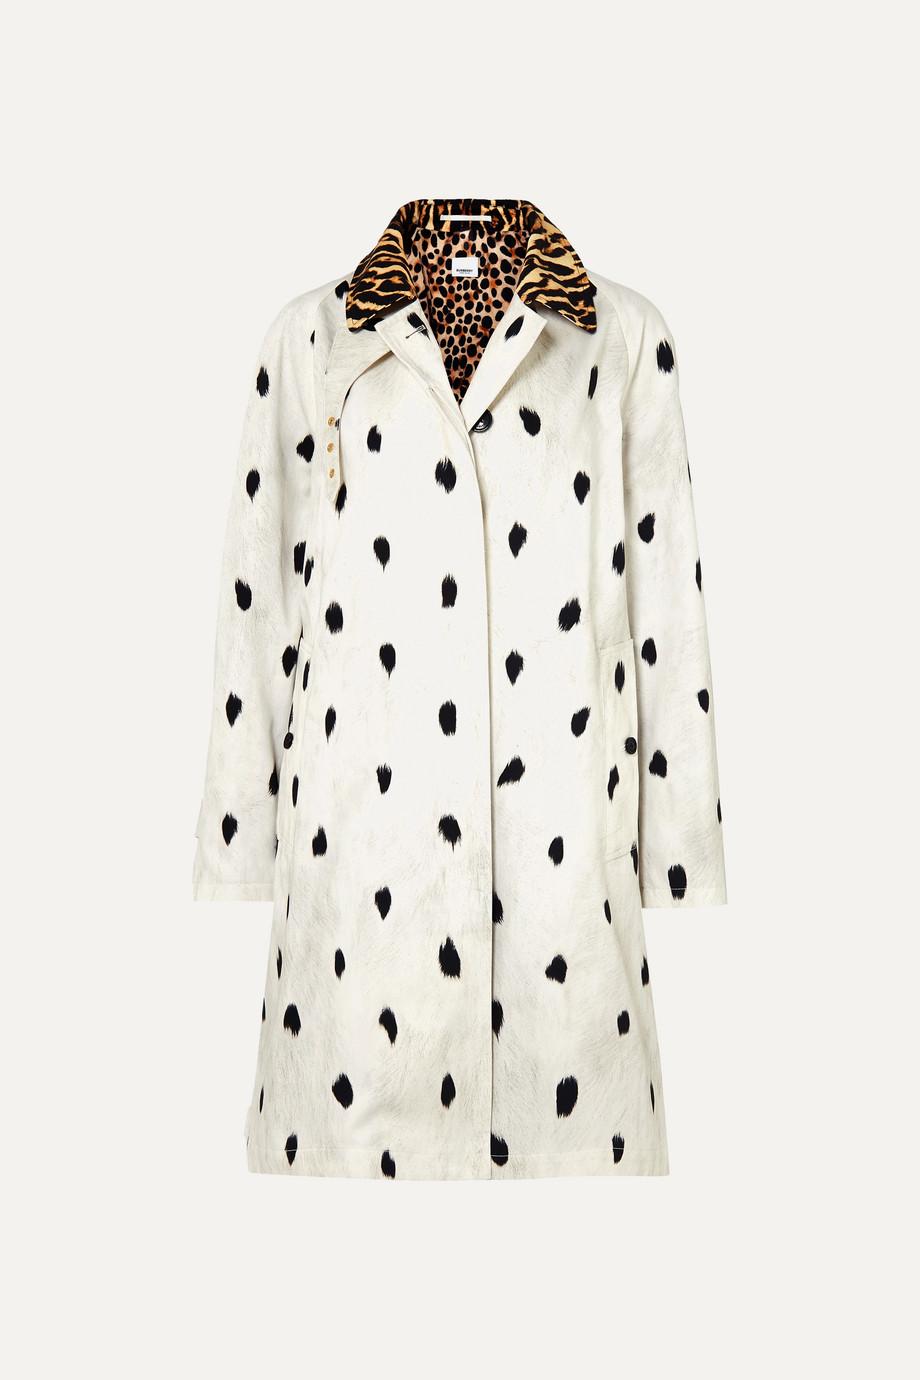 Burberry Animal-print cotton-twill trench coat